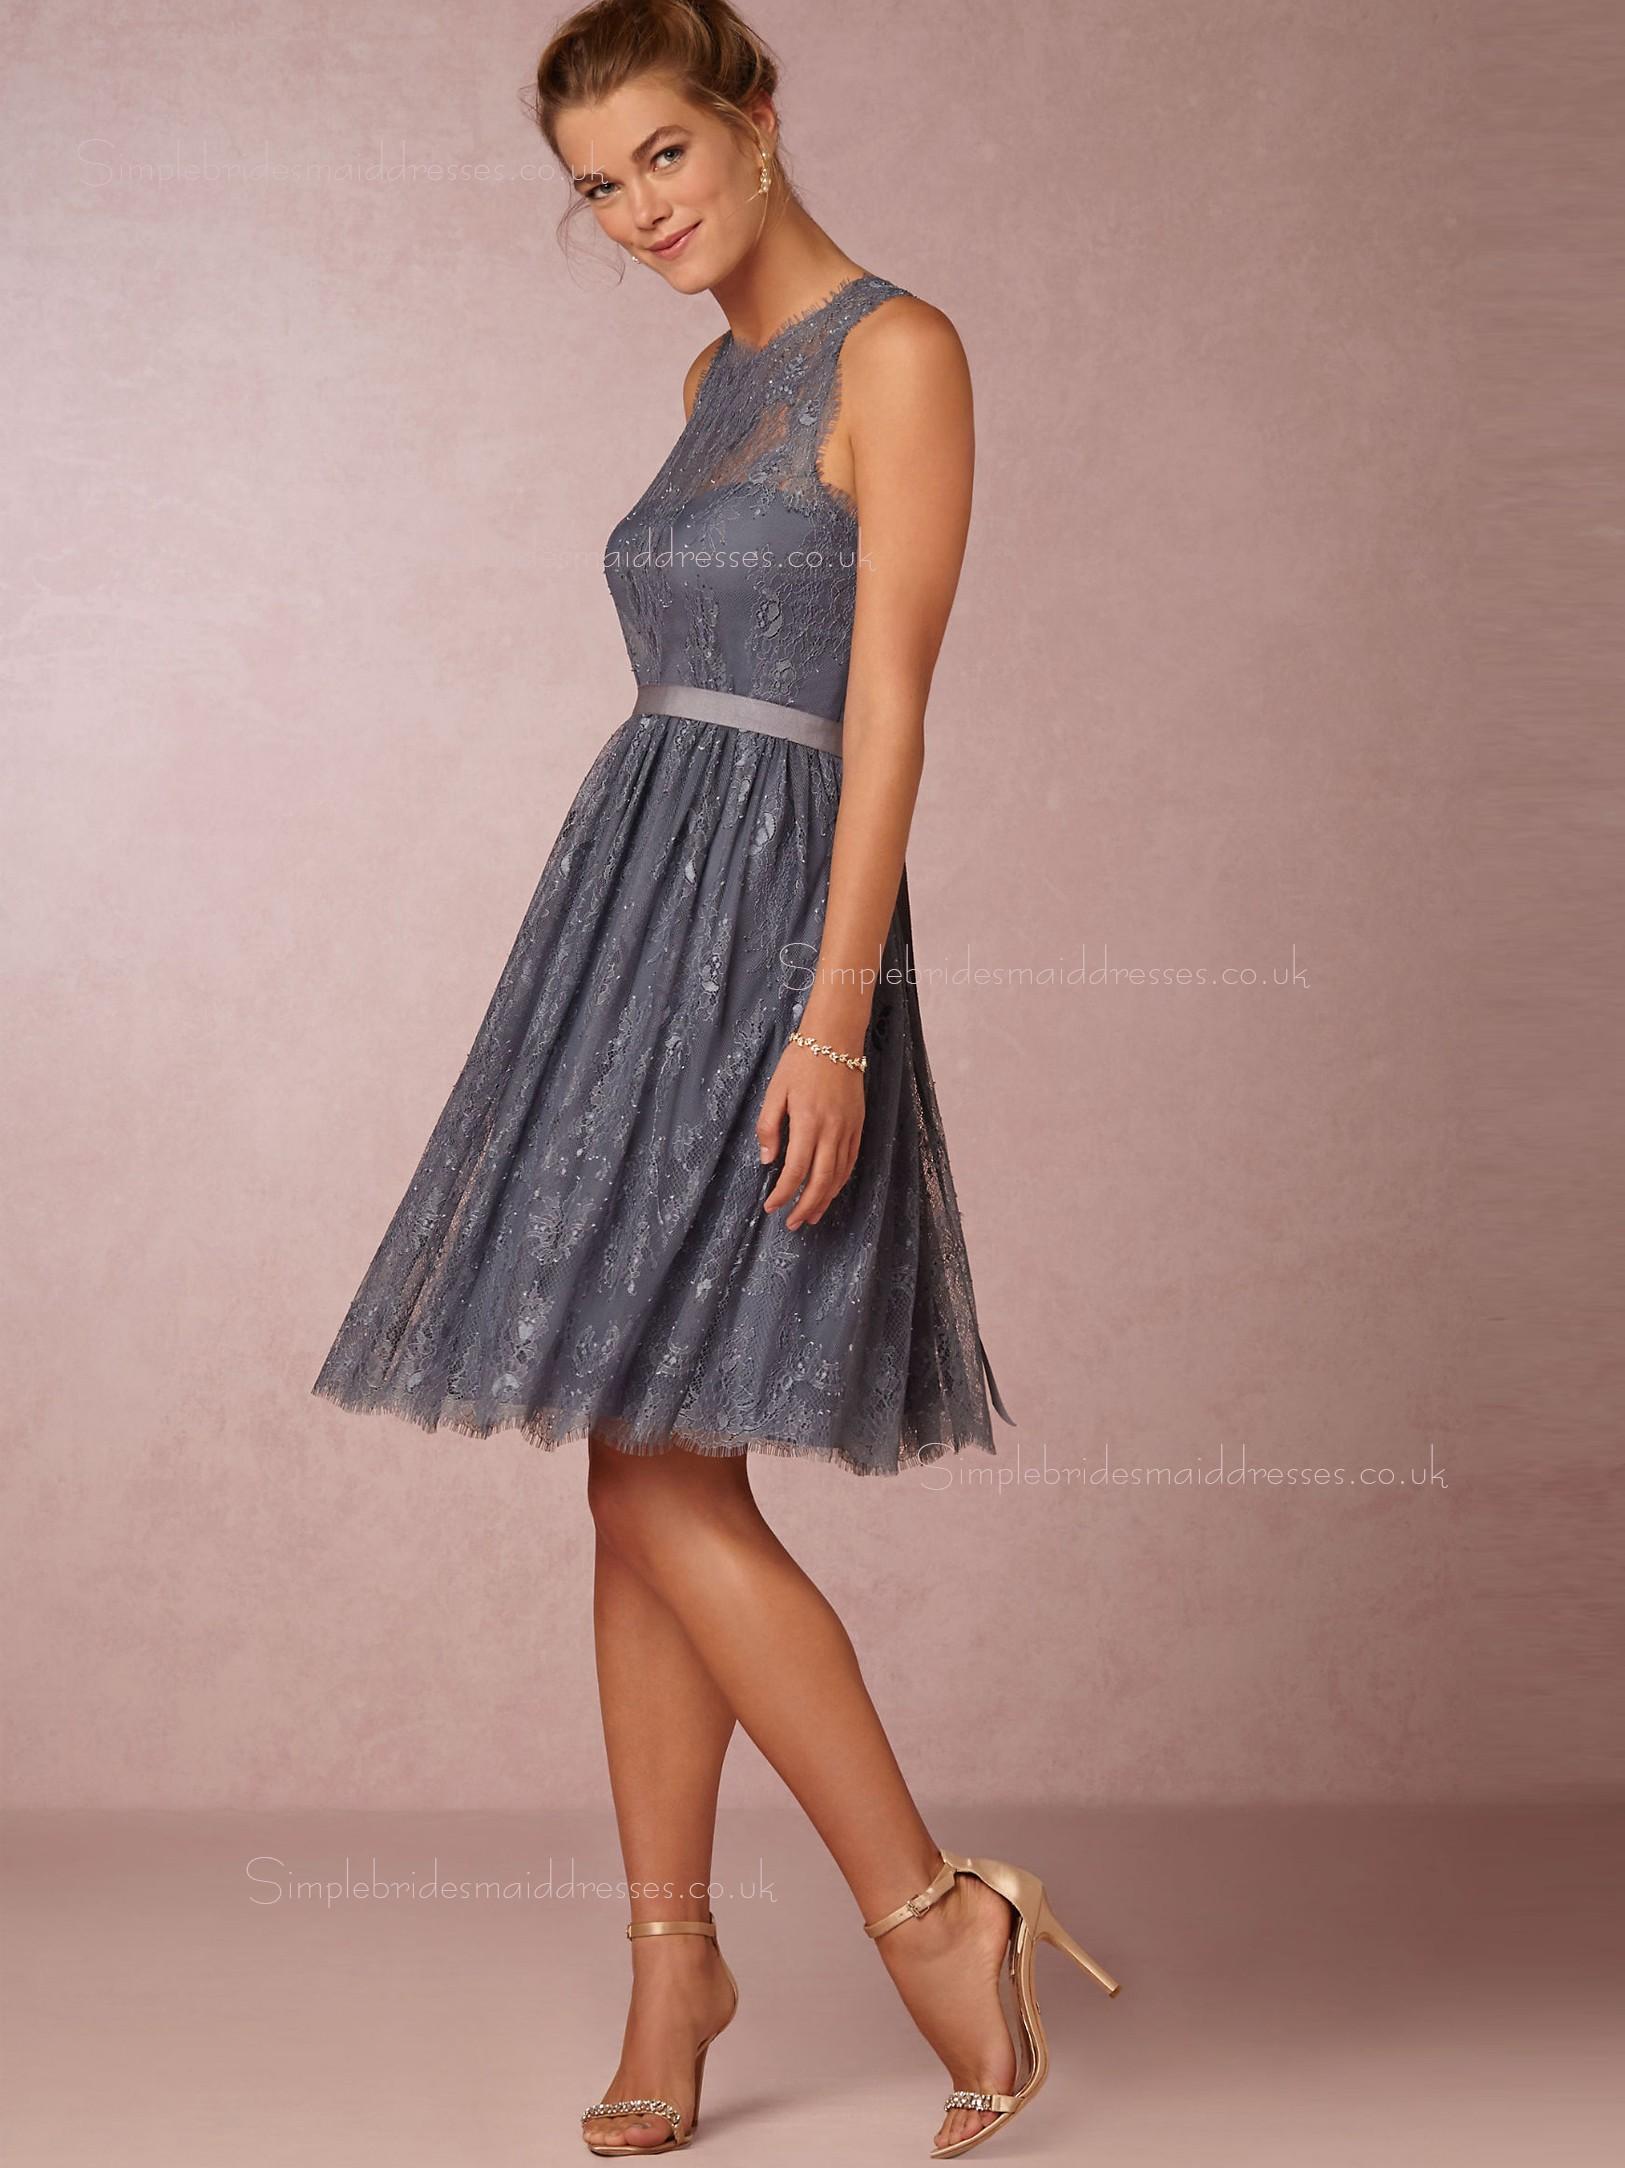 Shop Beautiful Lace Knee length Gray Bridesmaid Dresses